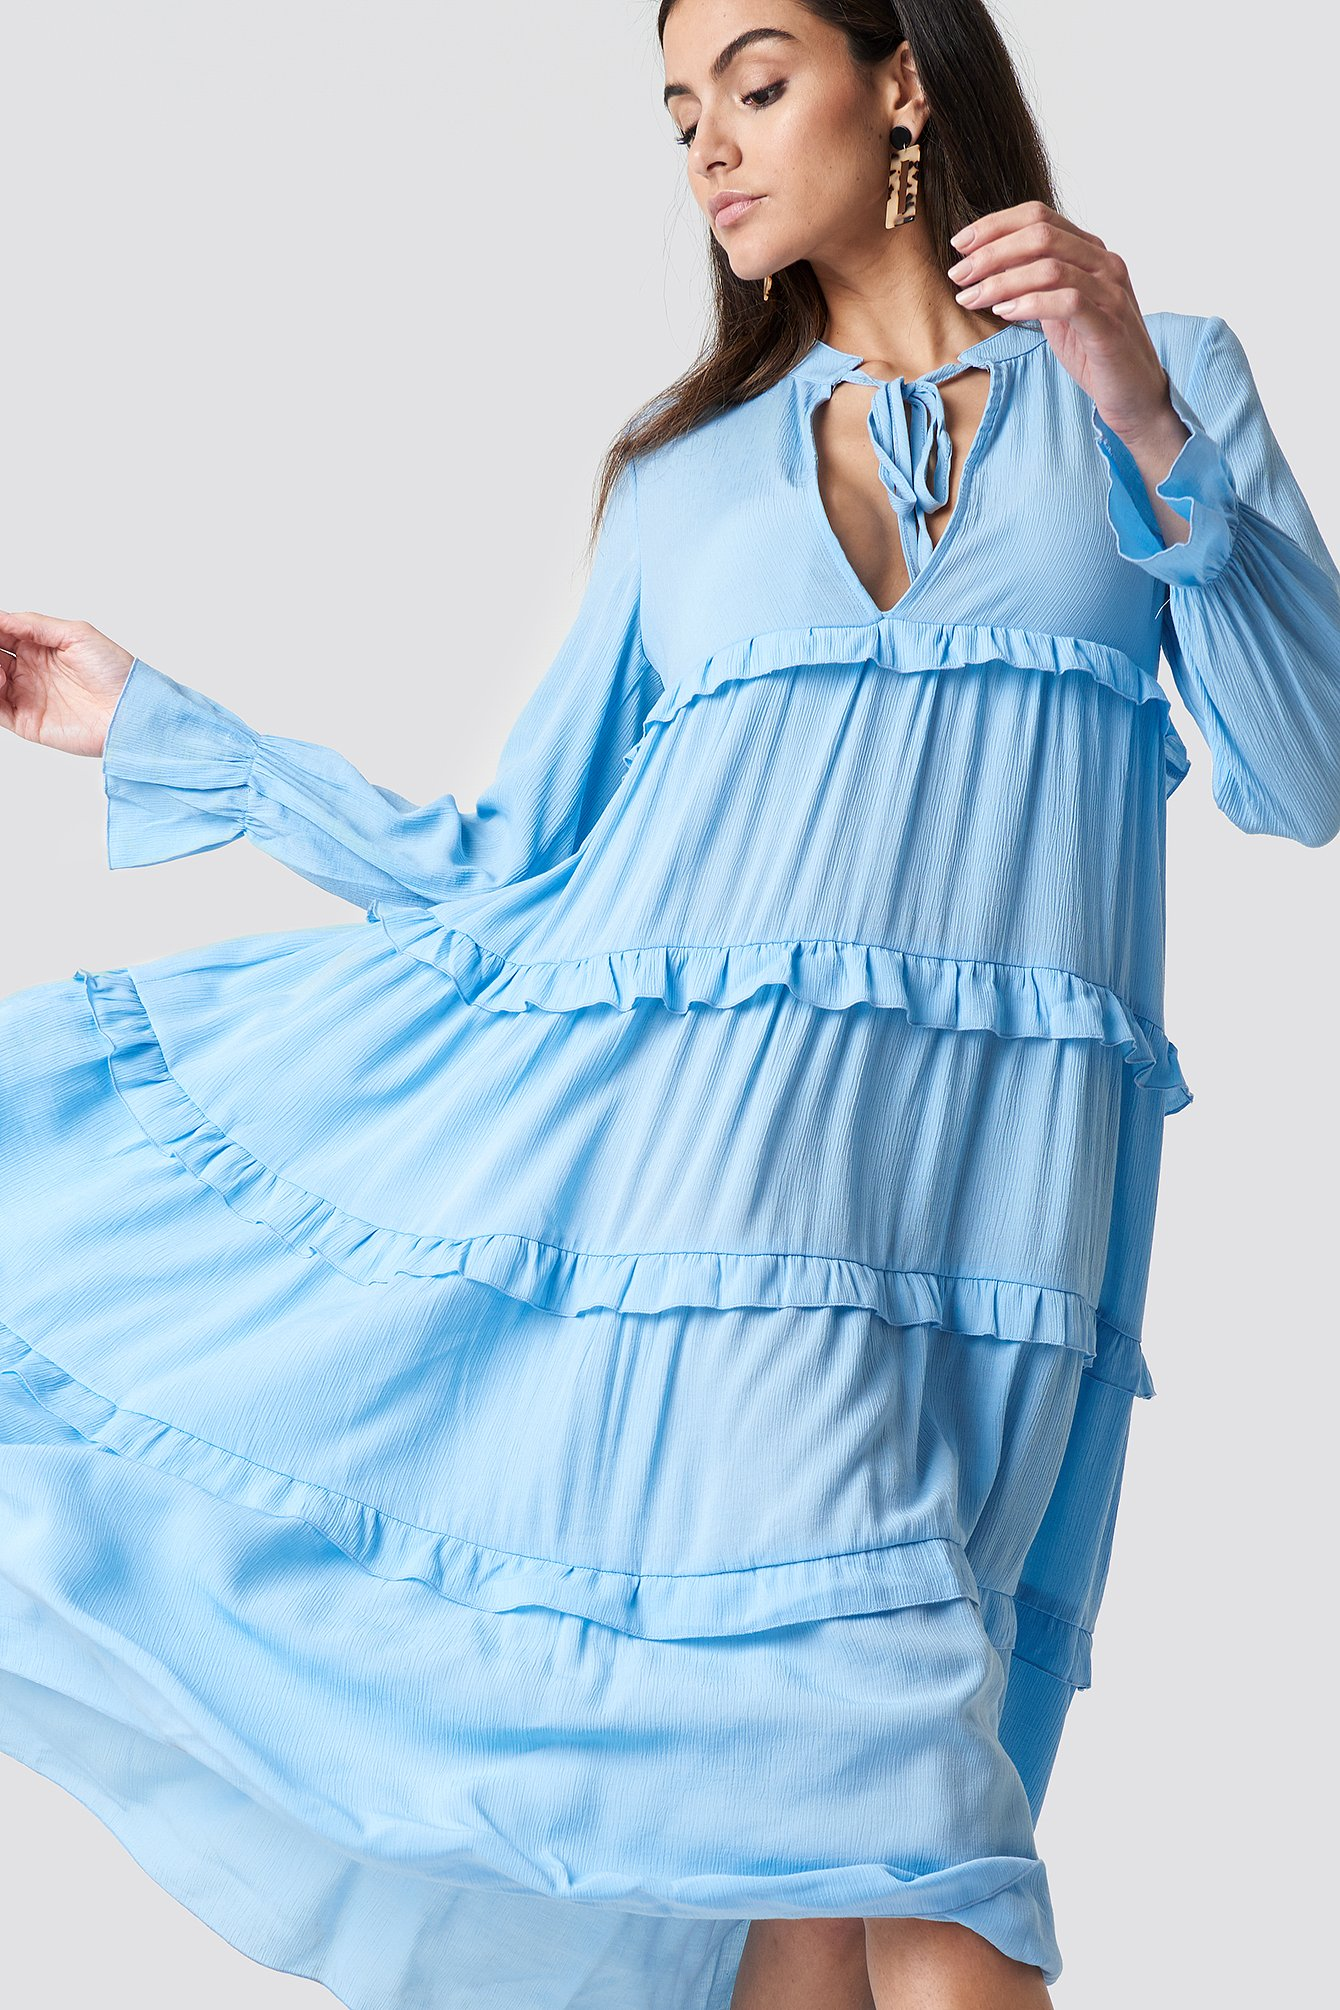 TRENDYOL FLYWHEEL MAXI DRESS - BLUE